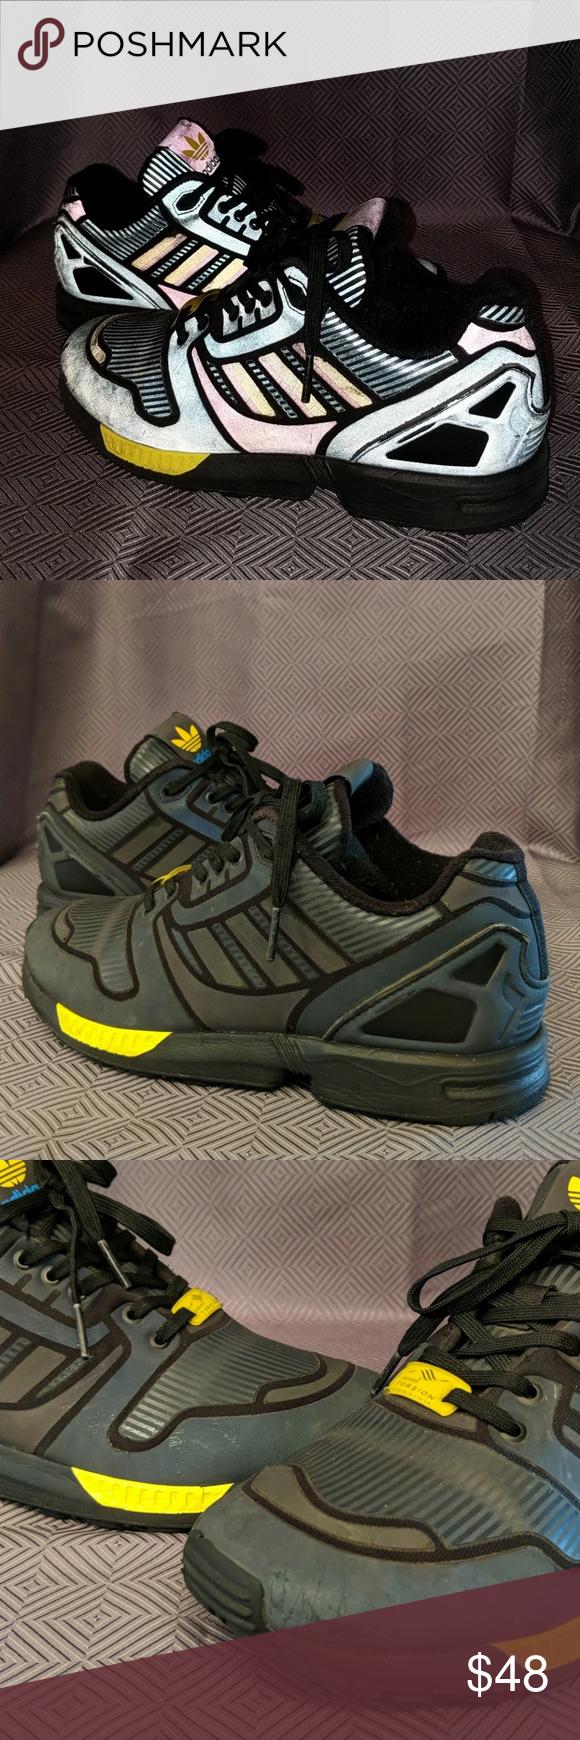 separation shoes cbfb8 48876 Adidas Torsion Reflective Men's/big boys size 5. Used but ...